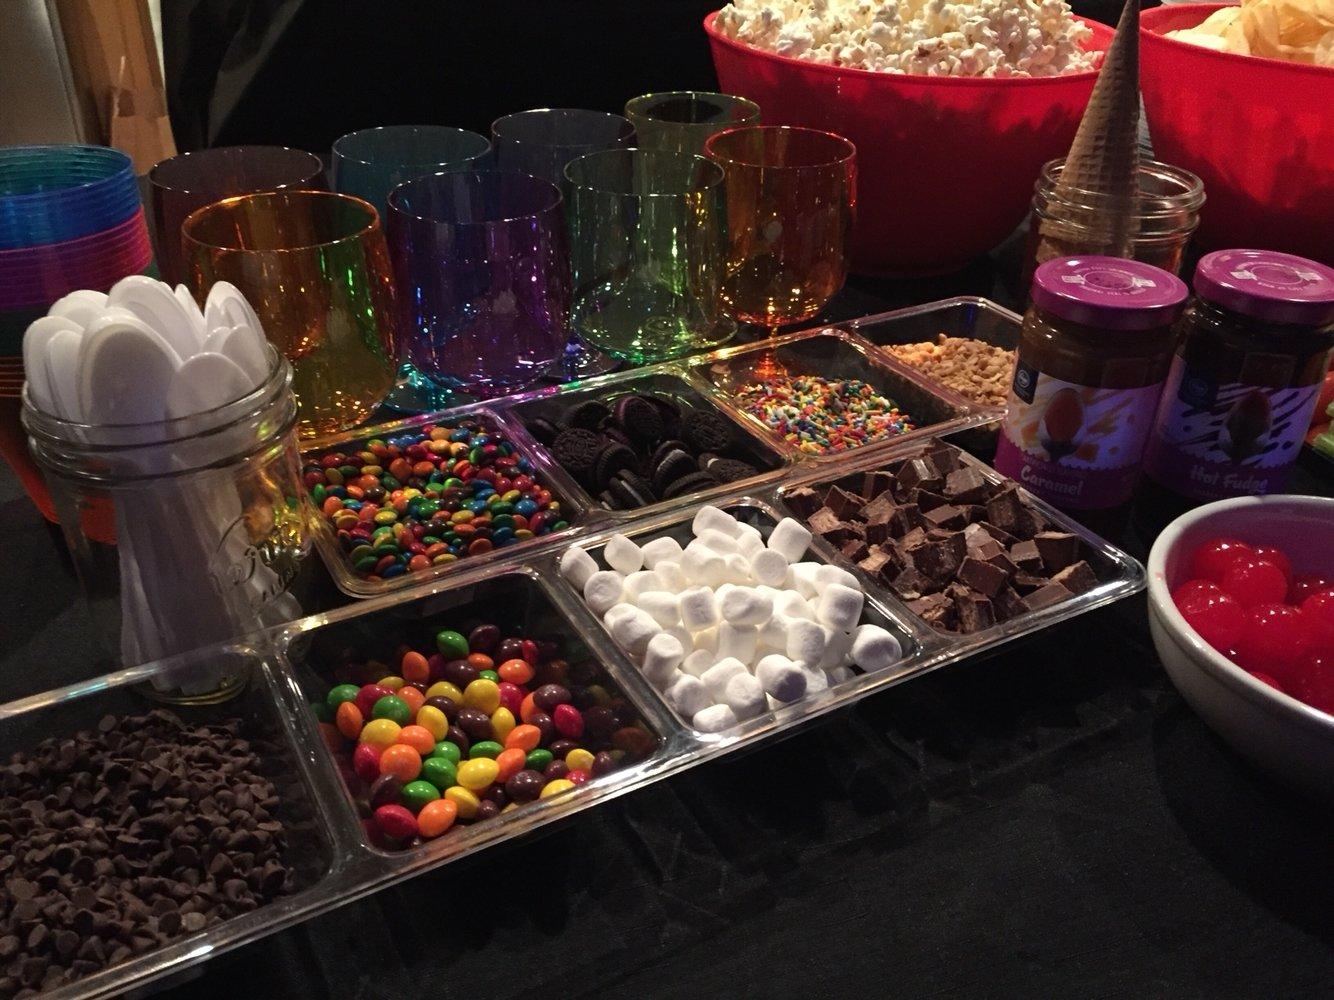 10 Cute Party Ideas For 16 Year Old Boy teen boy bday party glow in the dark neon blacklight sundae bar 7 2020